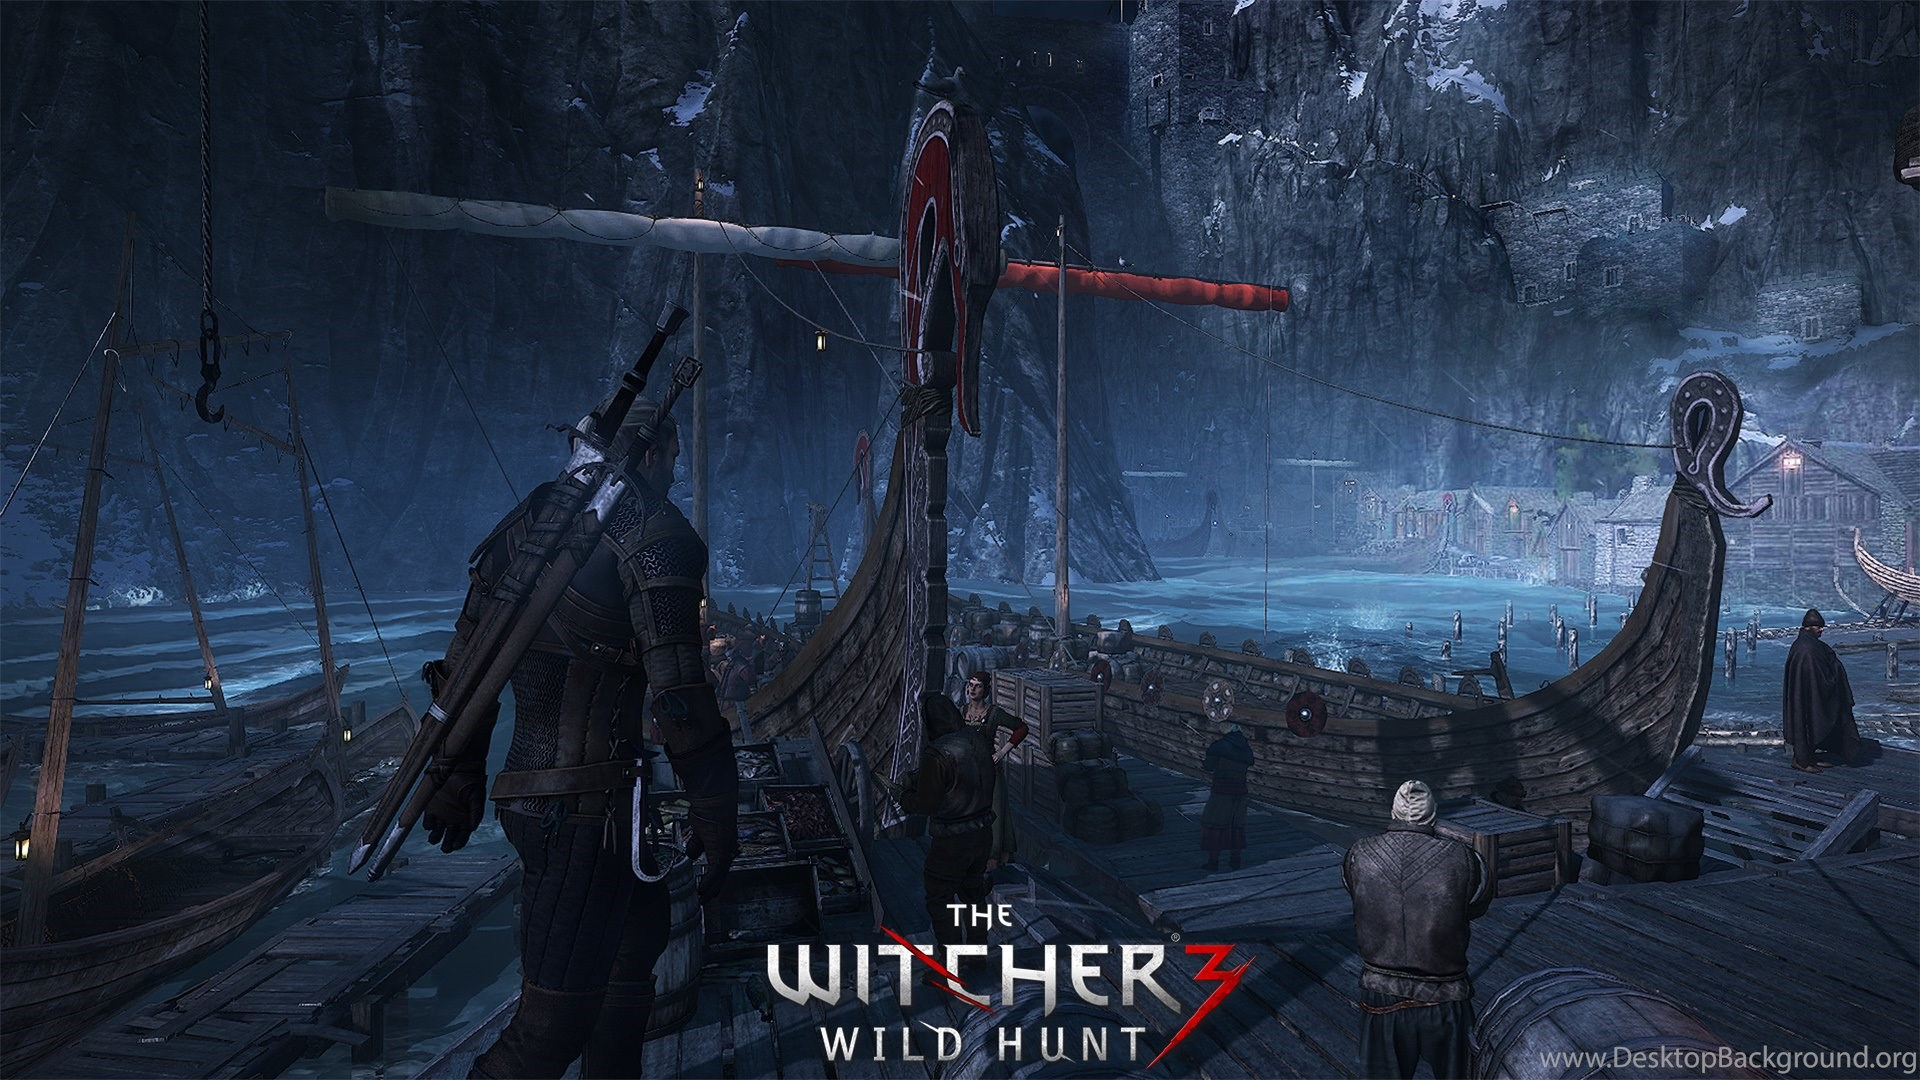 The Witcher 3 Wild Hunt Wallpapers 9 Desktop Background